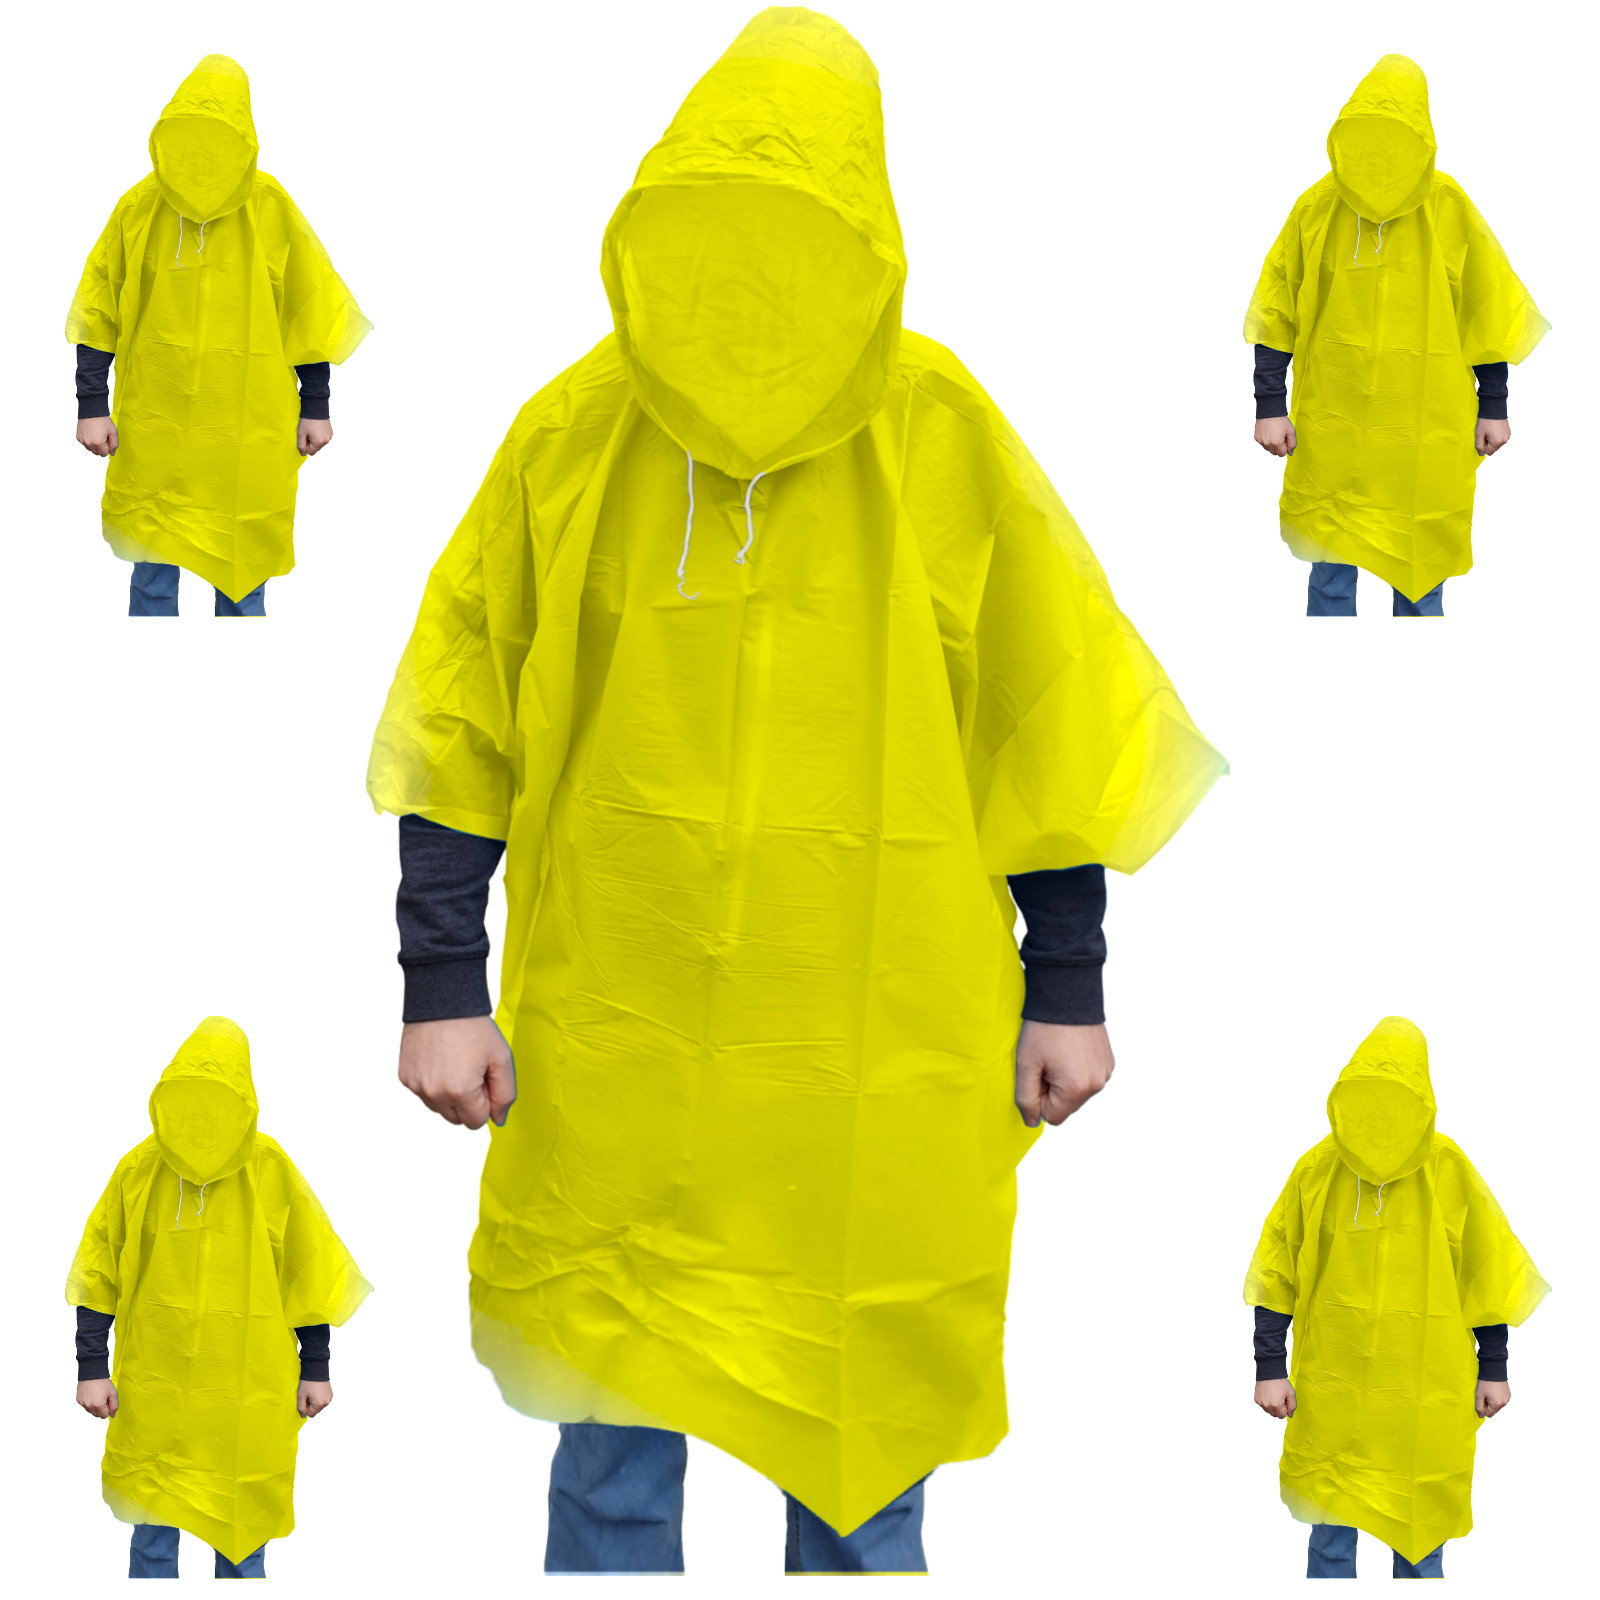 9500 Regenponcho mit Kaputze Regen Poncho gelb